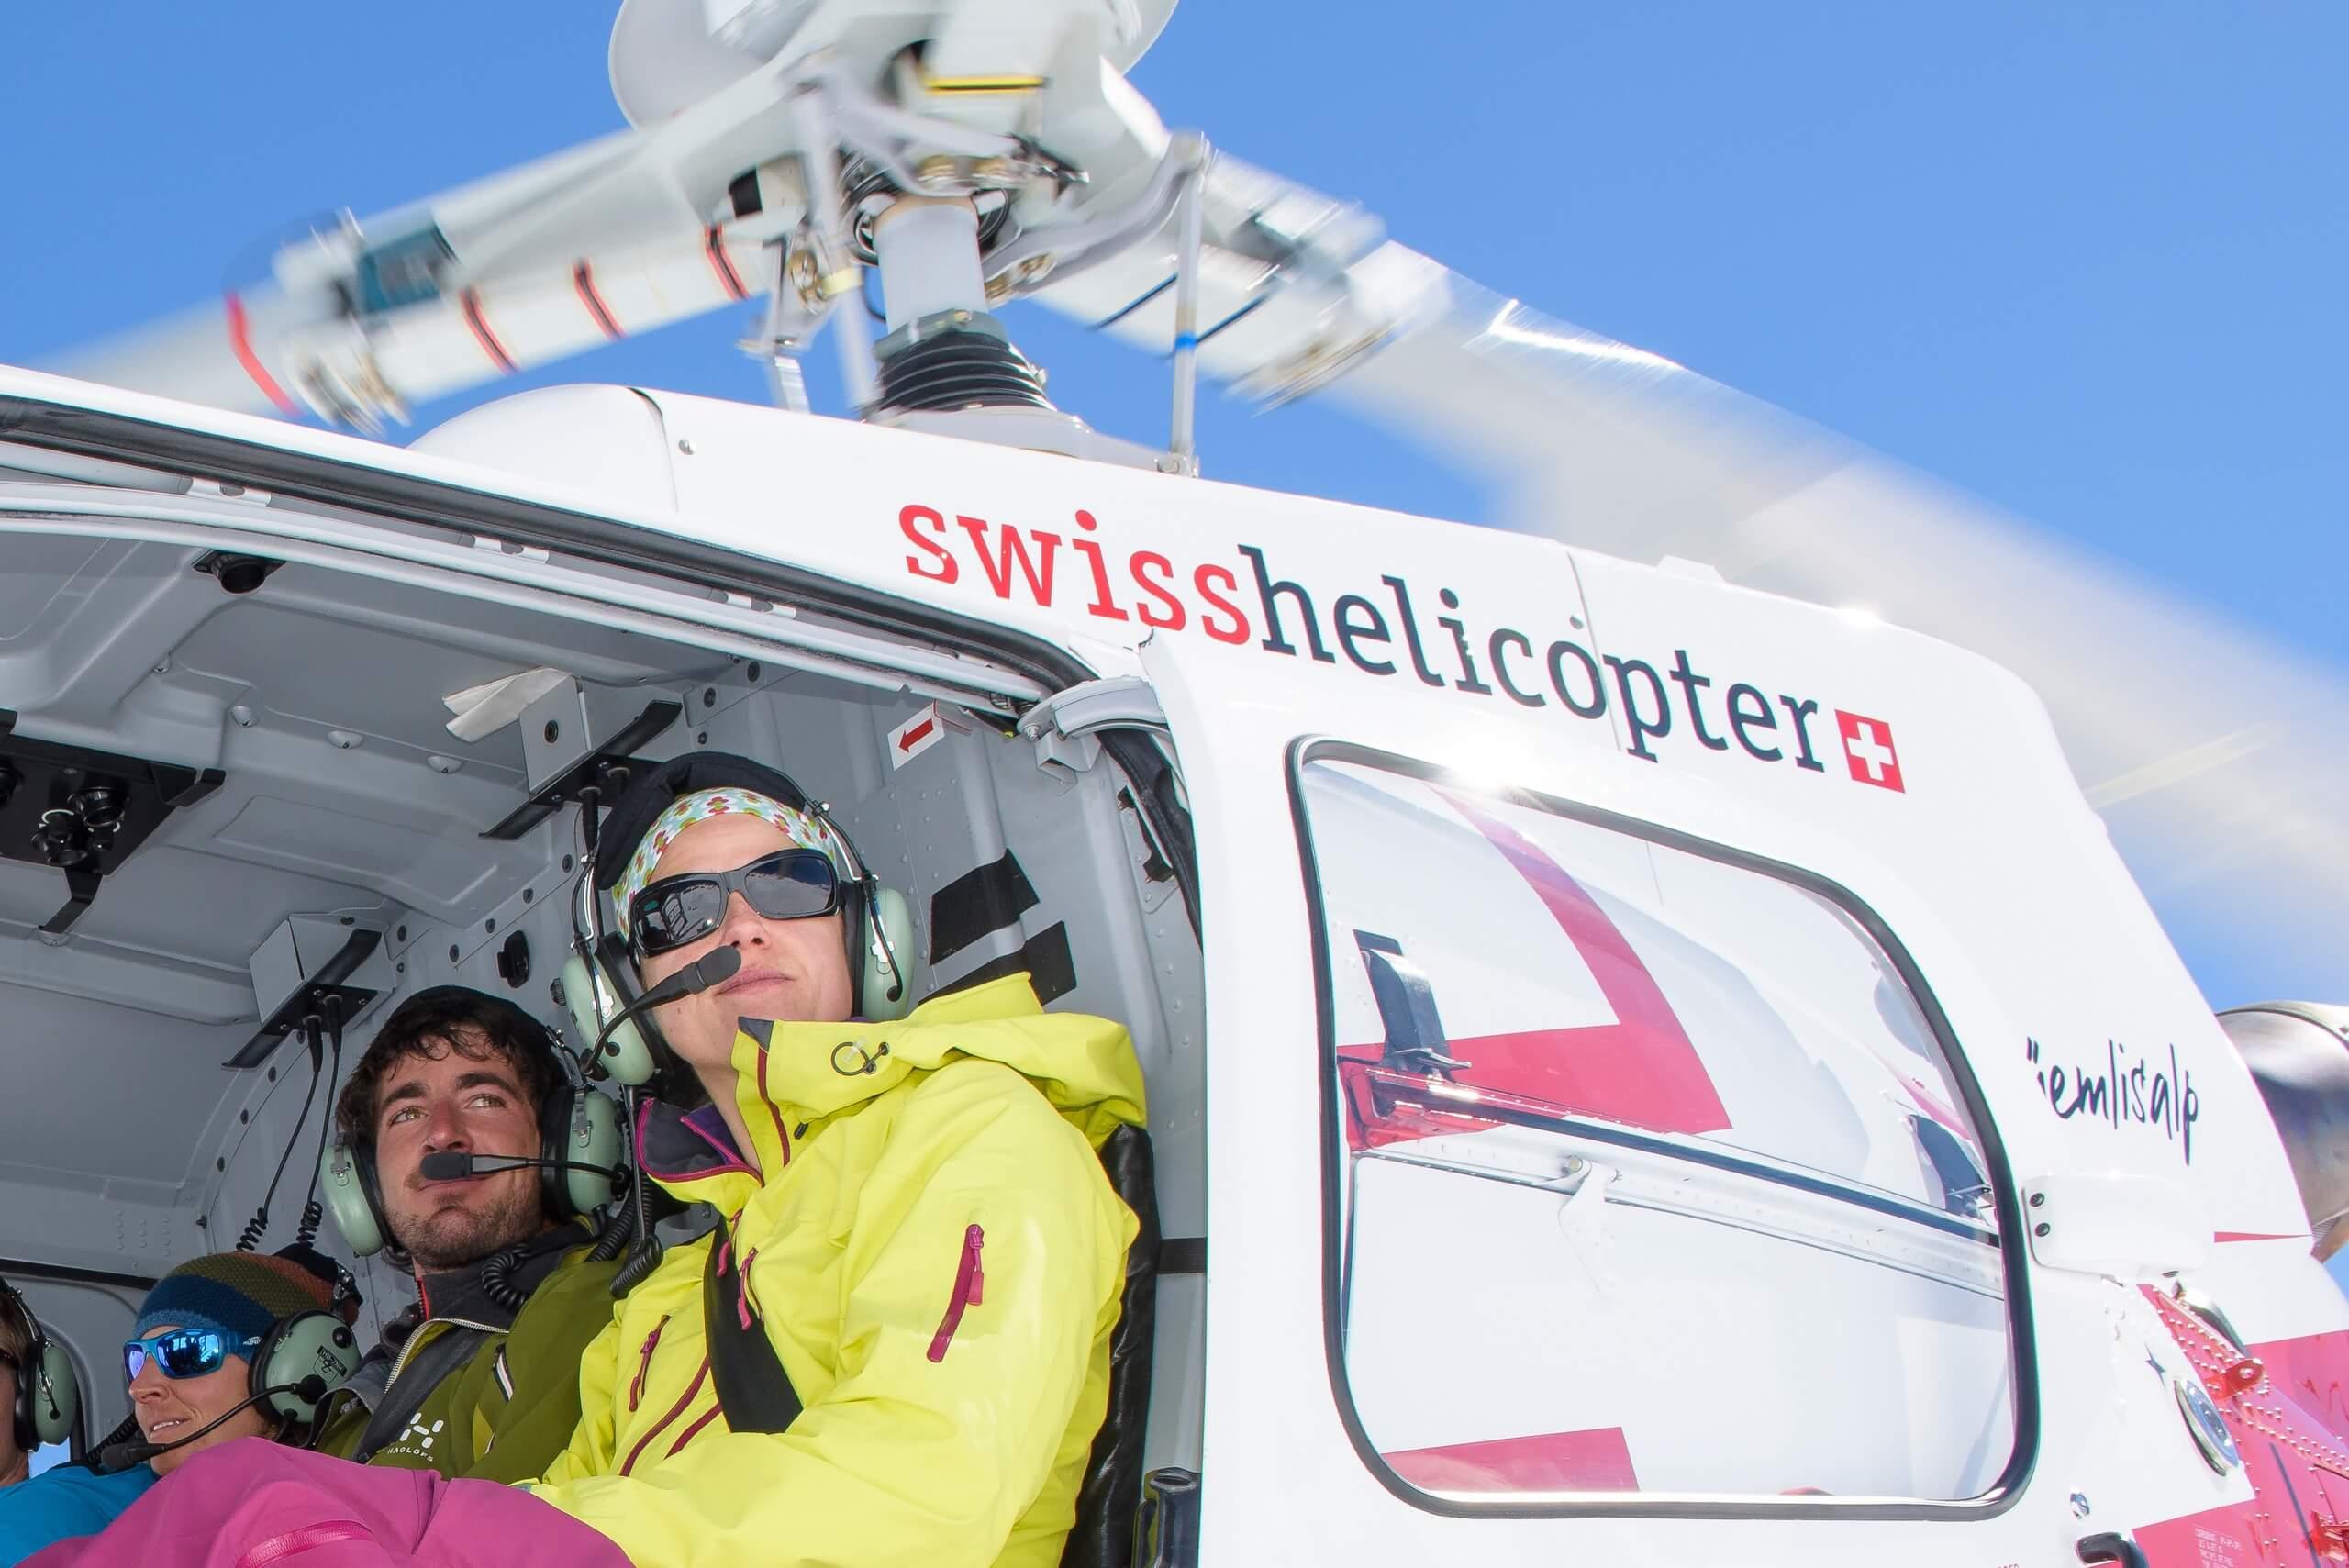 swiss-helicopter-ausblick-winter-berge